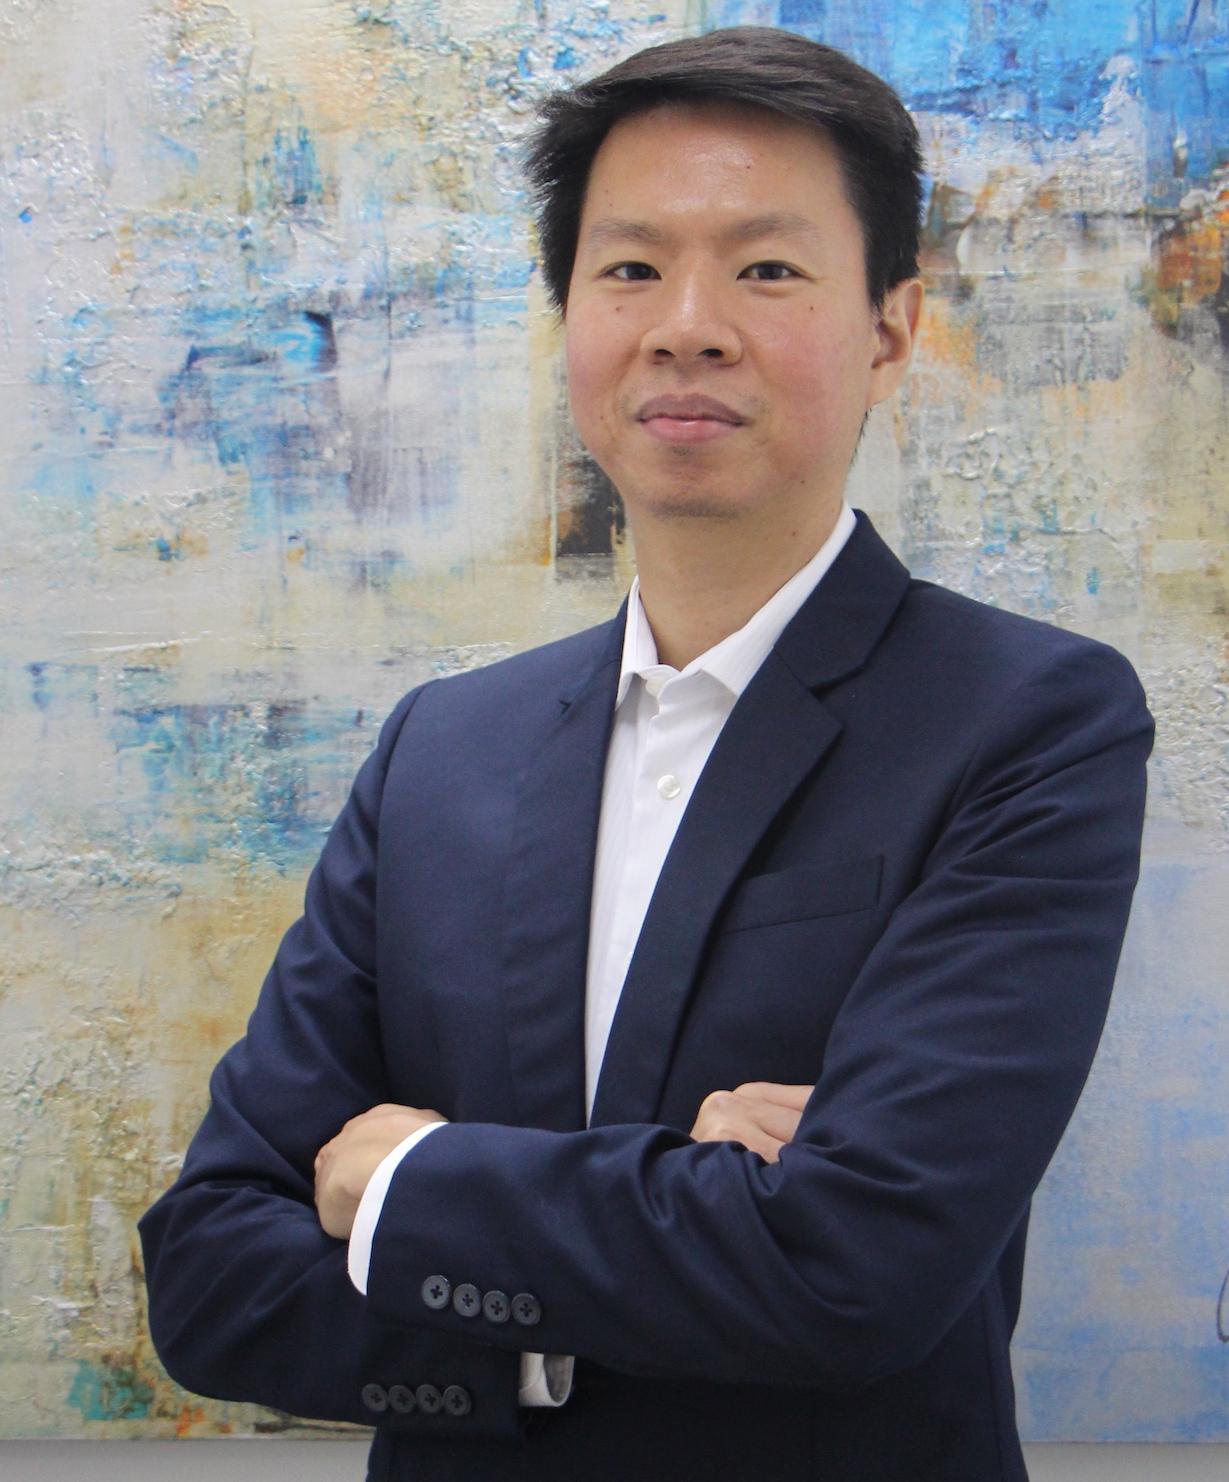 Kerwin Tan